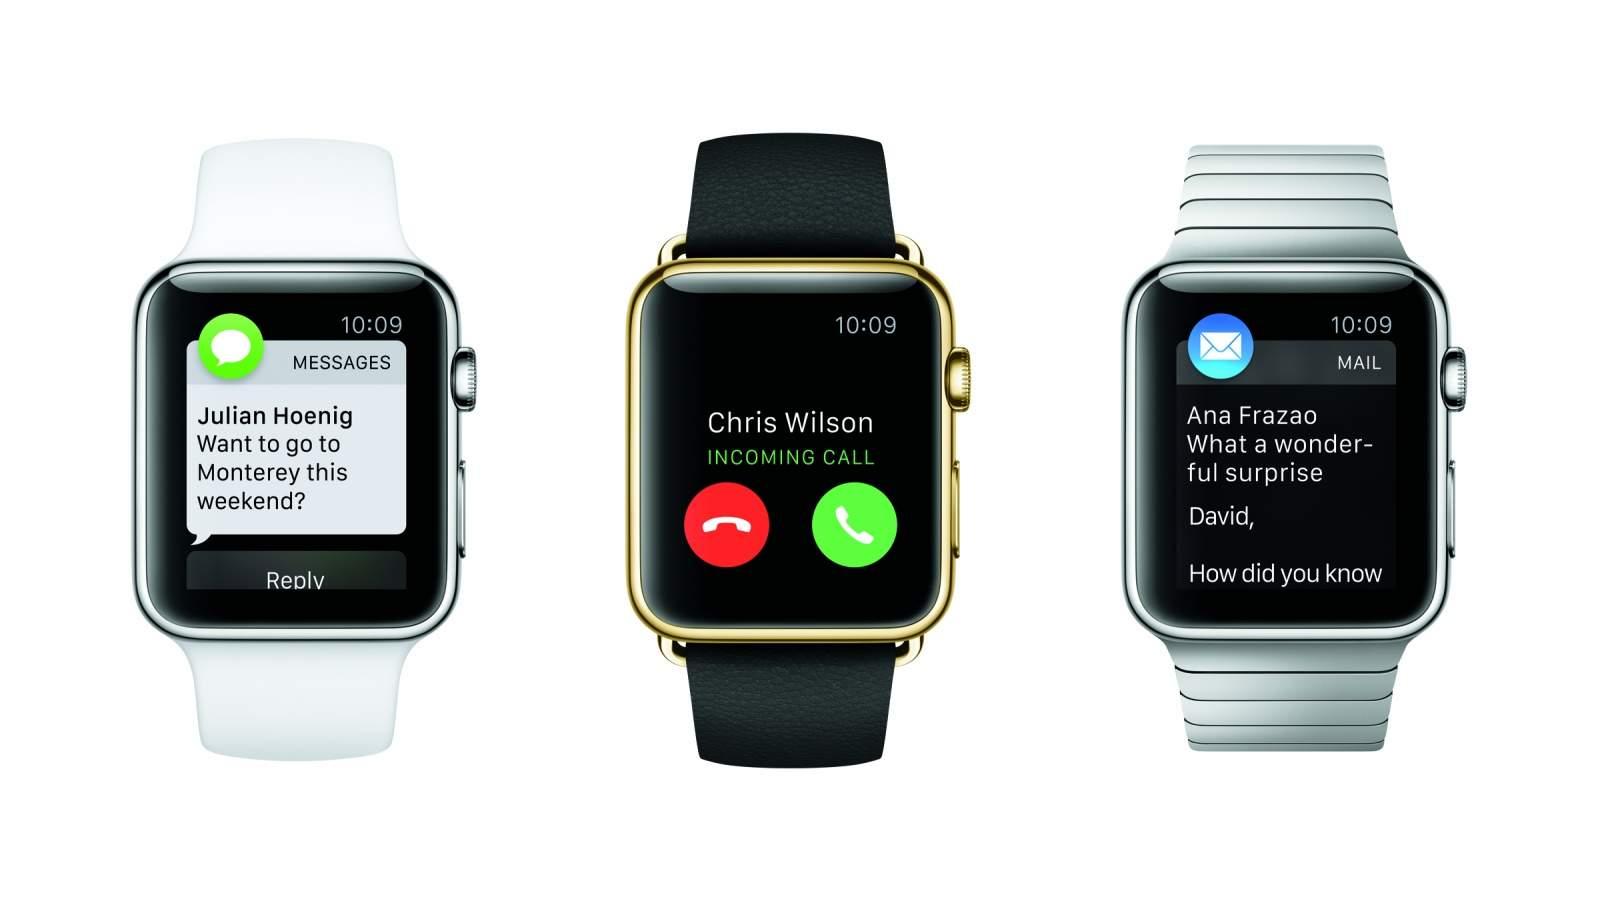 Apple Watch notifications siri